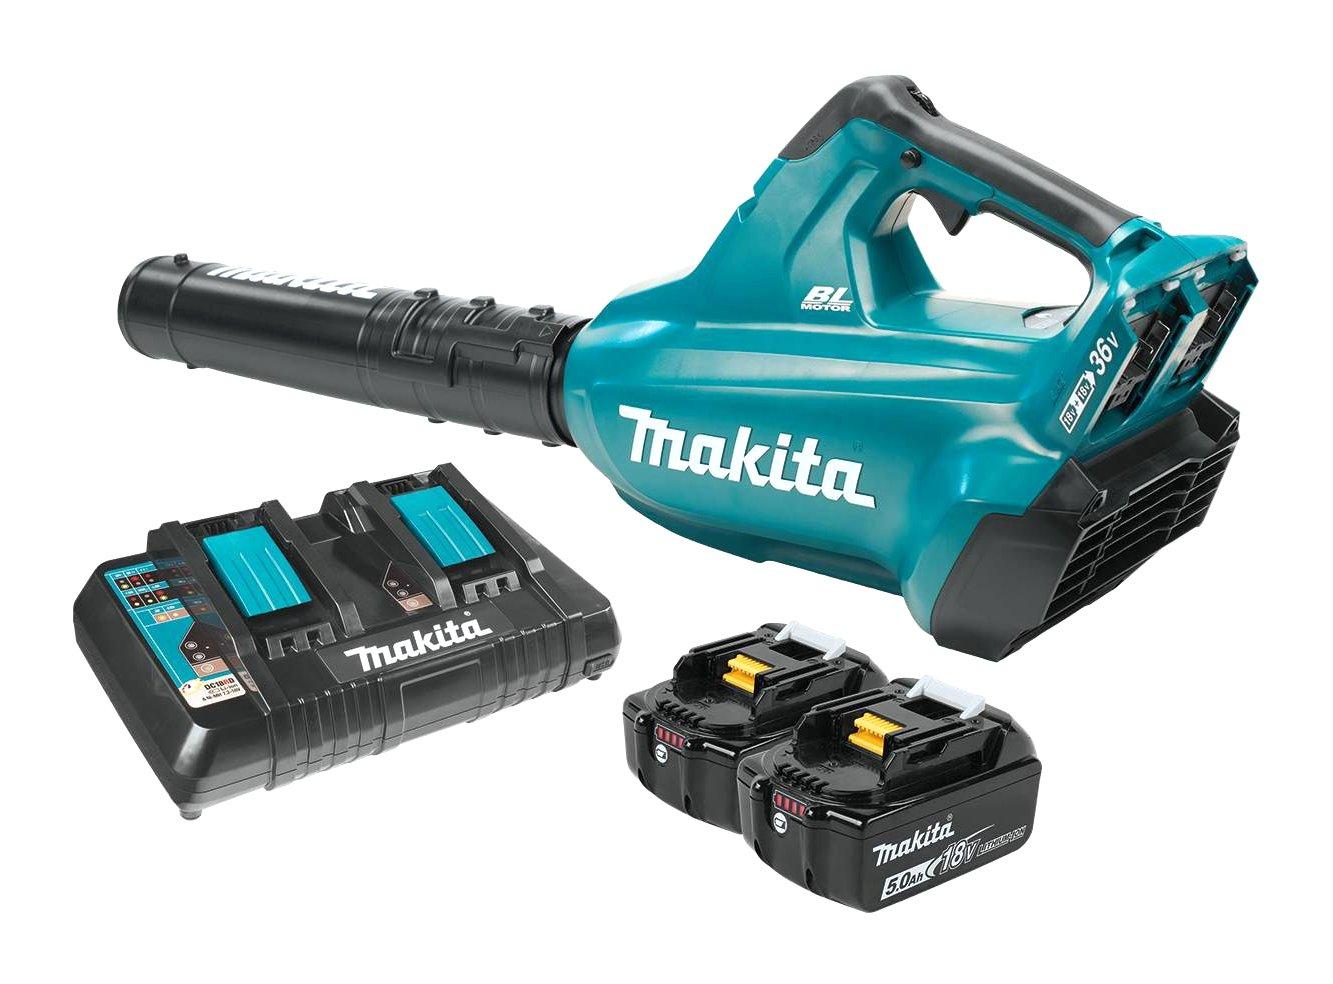 Makita XBU02PT Lithium-Ion Brushless Cordless Blower Kit